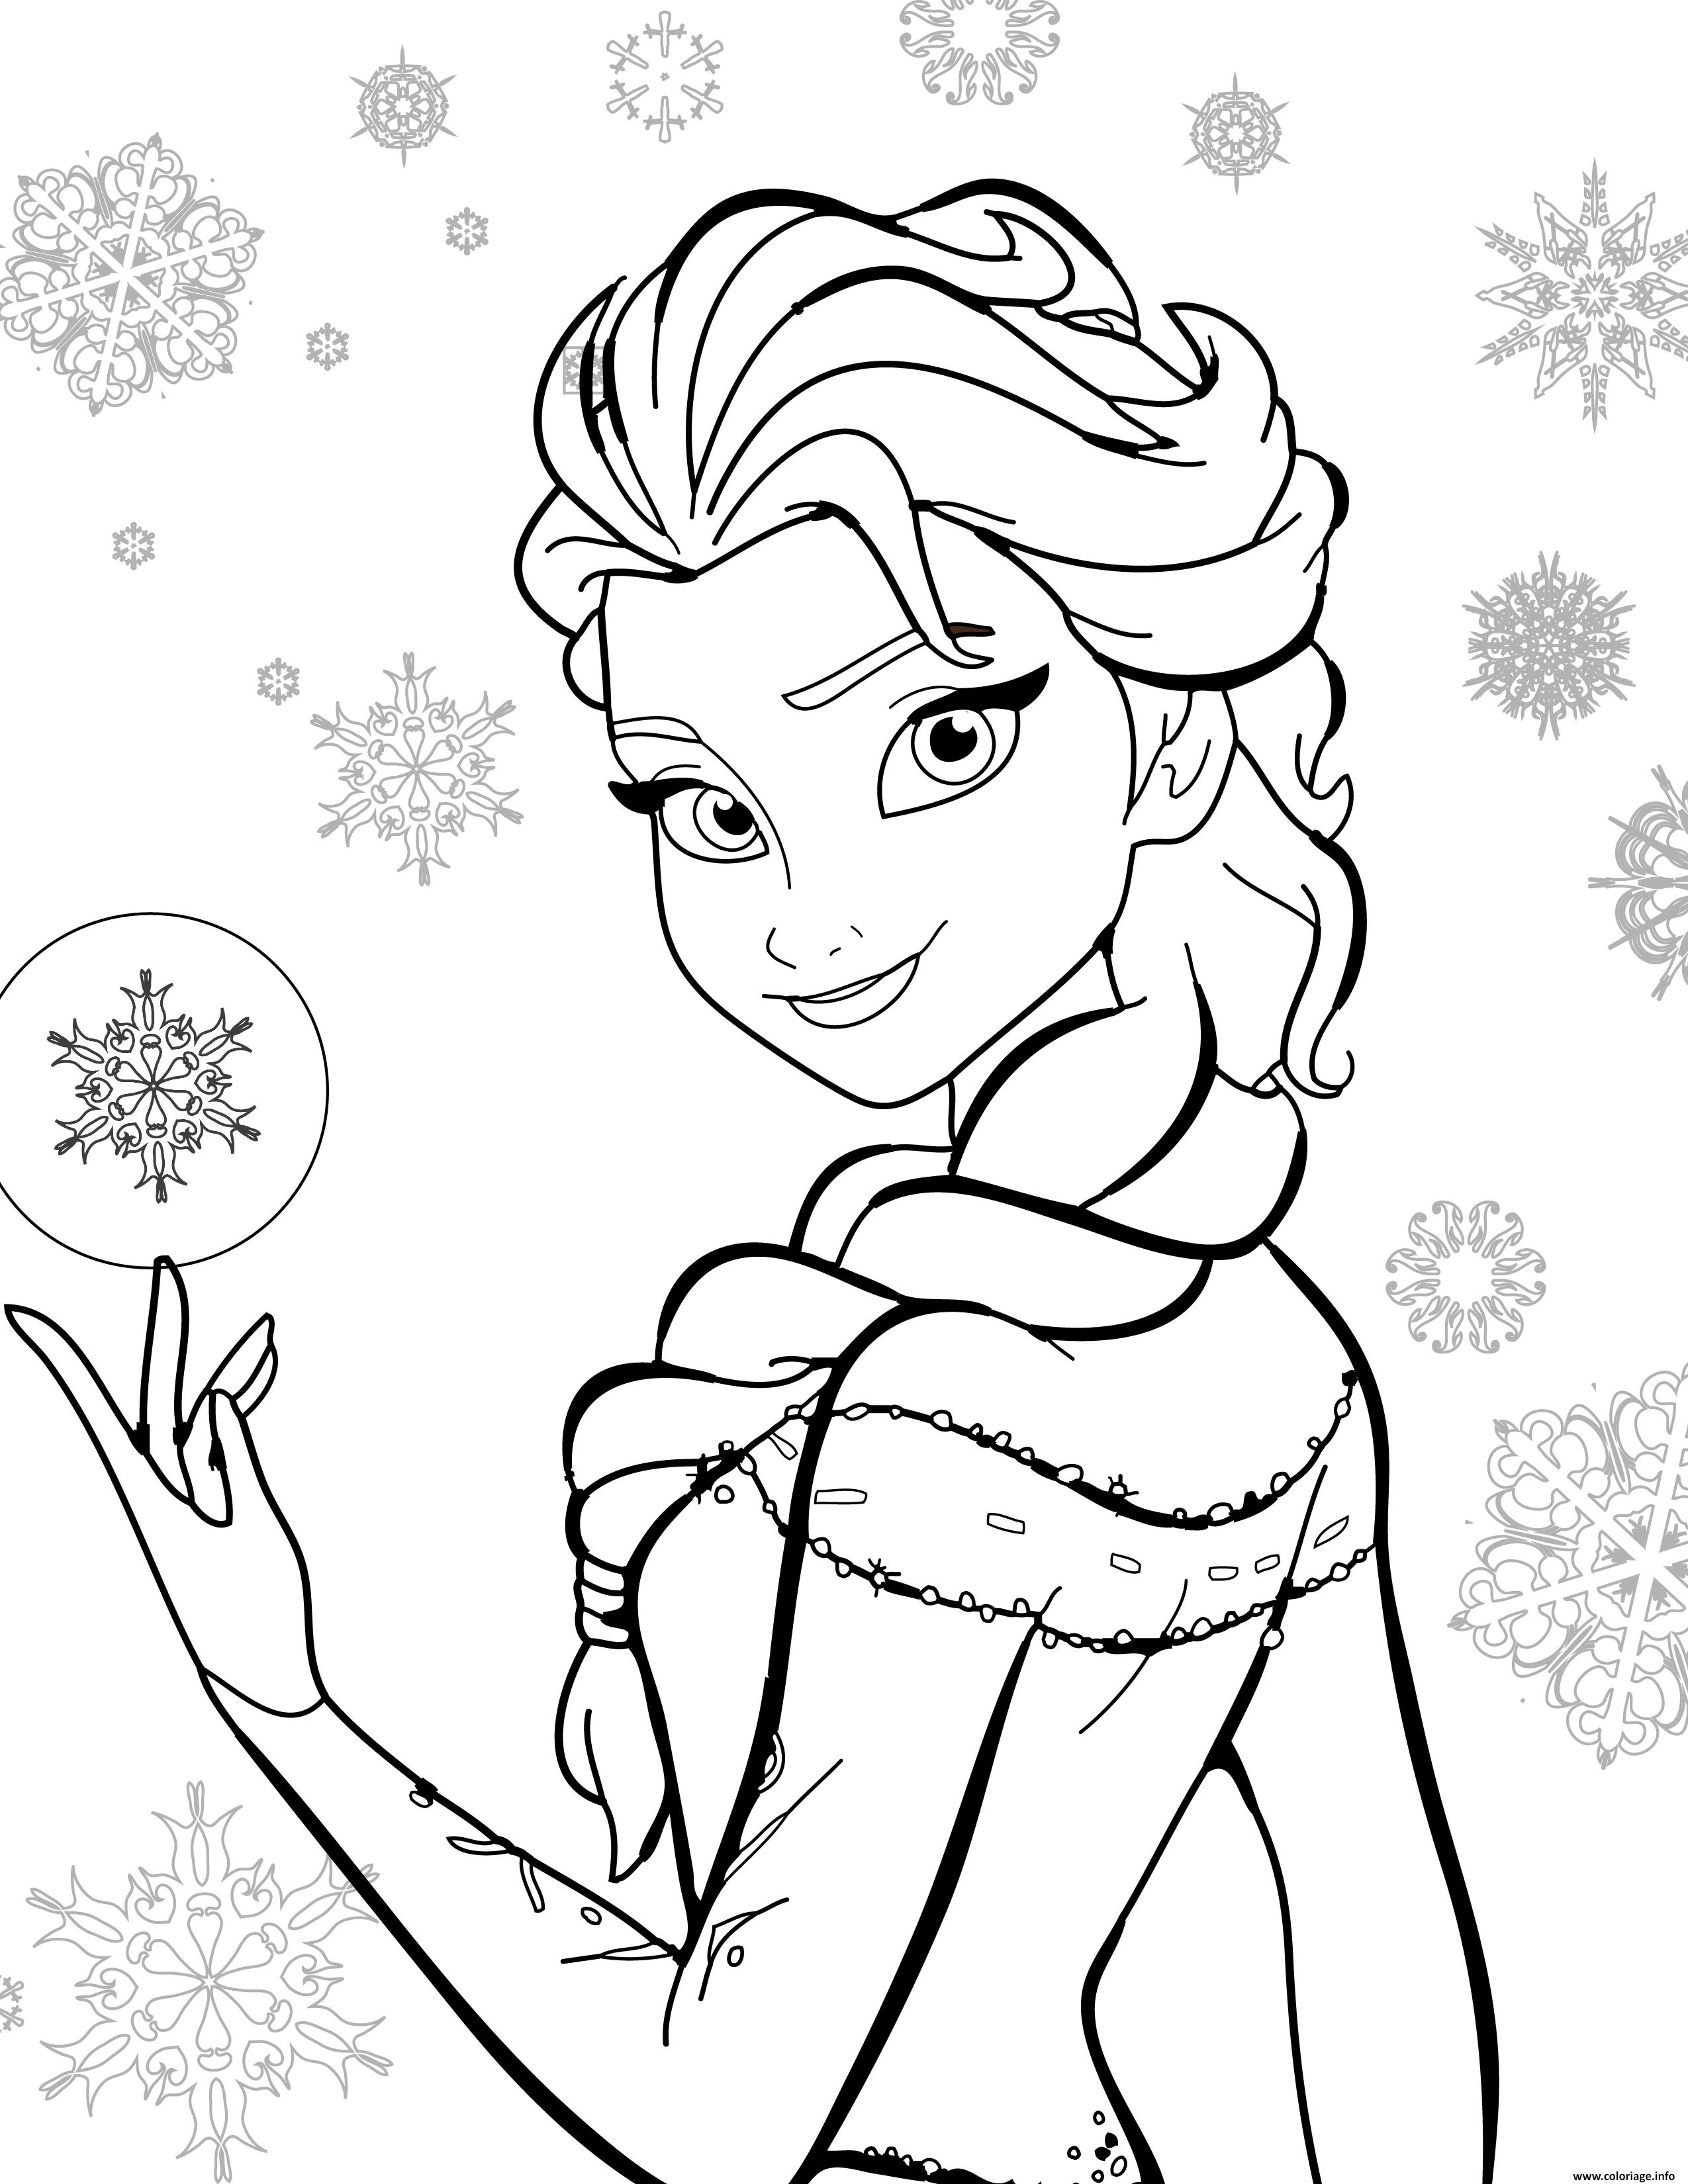 coloriage disney la reine des neiges dessin imprimer - Jeux En Ligne Reine Des Neiges